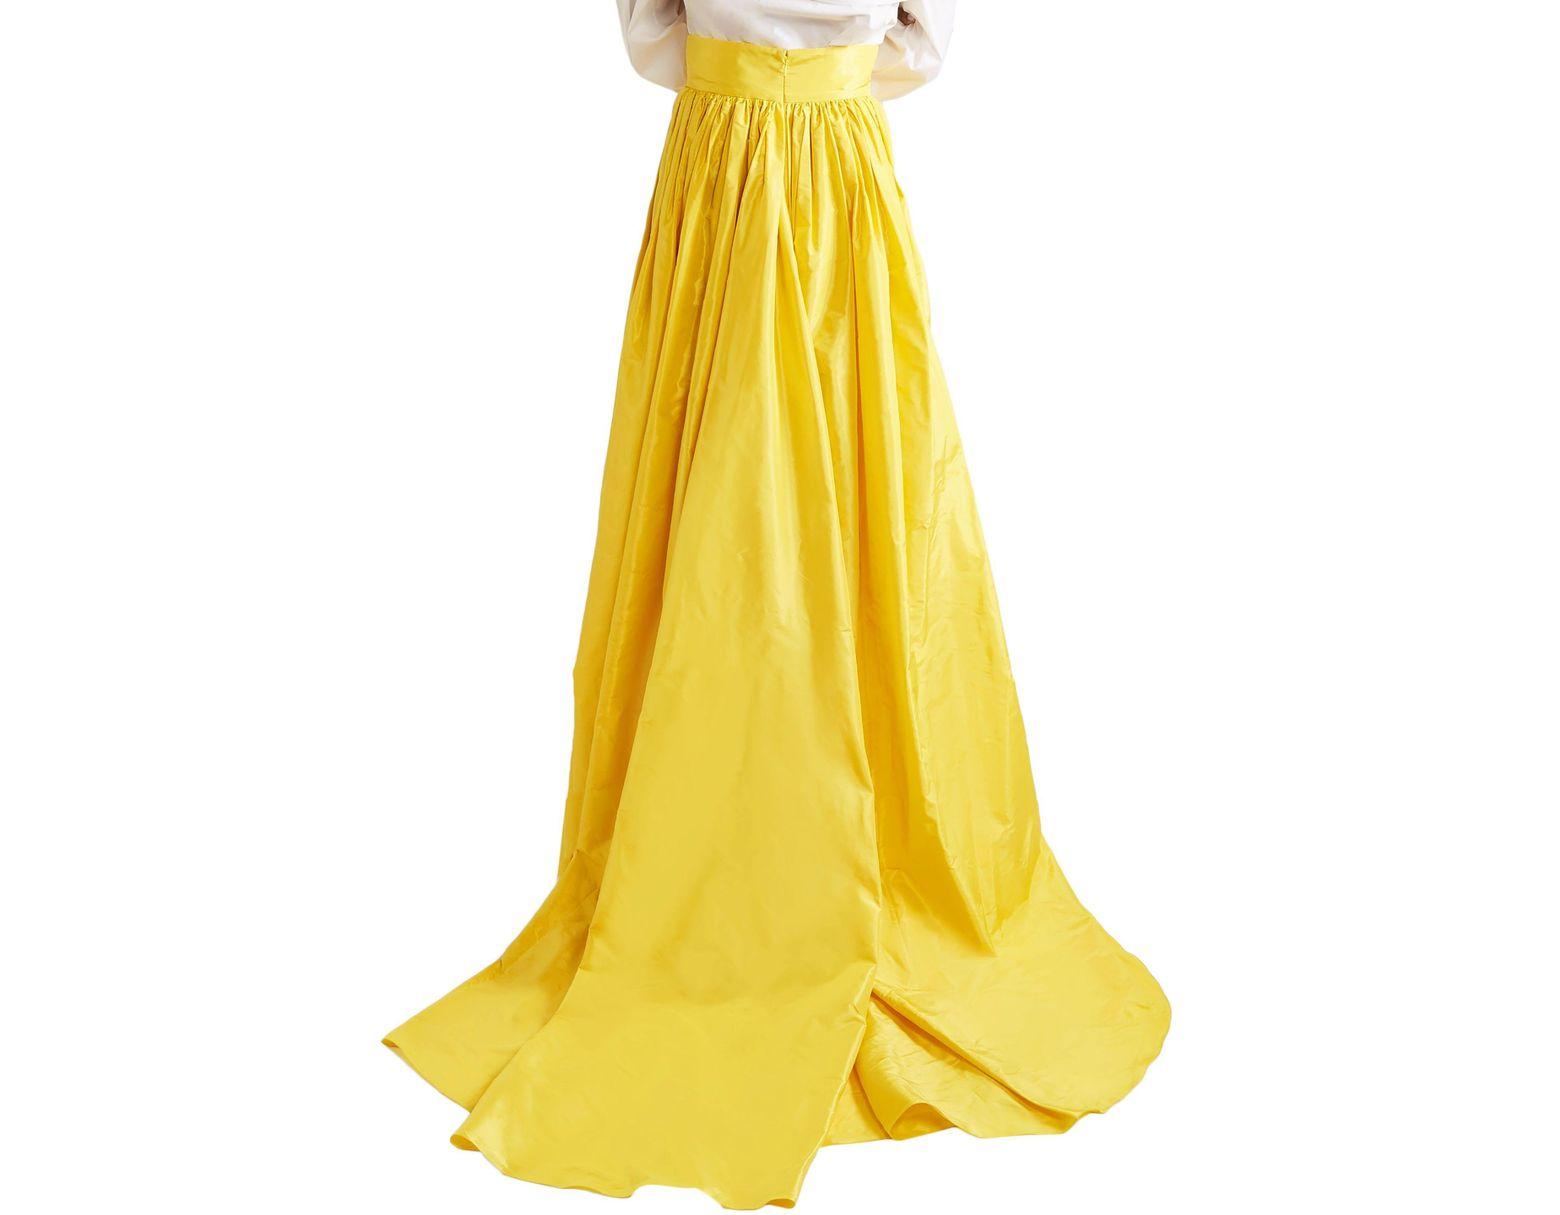 9e54e00db9 Carolina Herrera Flared Pleated Silk-taffeta Maxi Skirt Yellow in Yellow -  Save 32% - Lyst